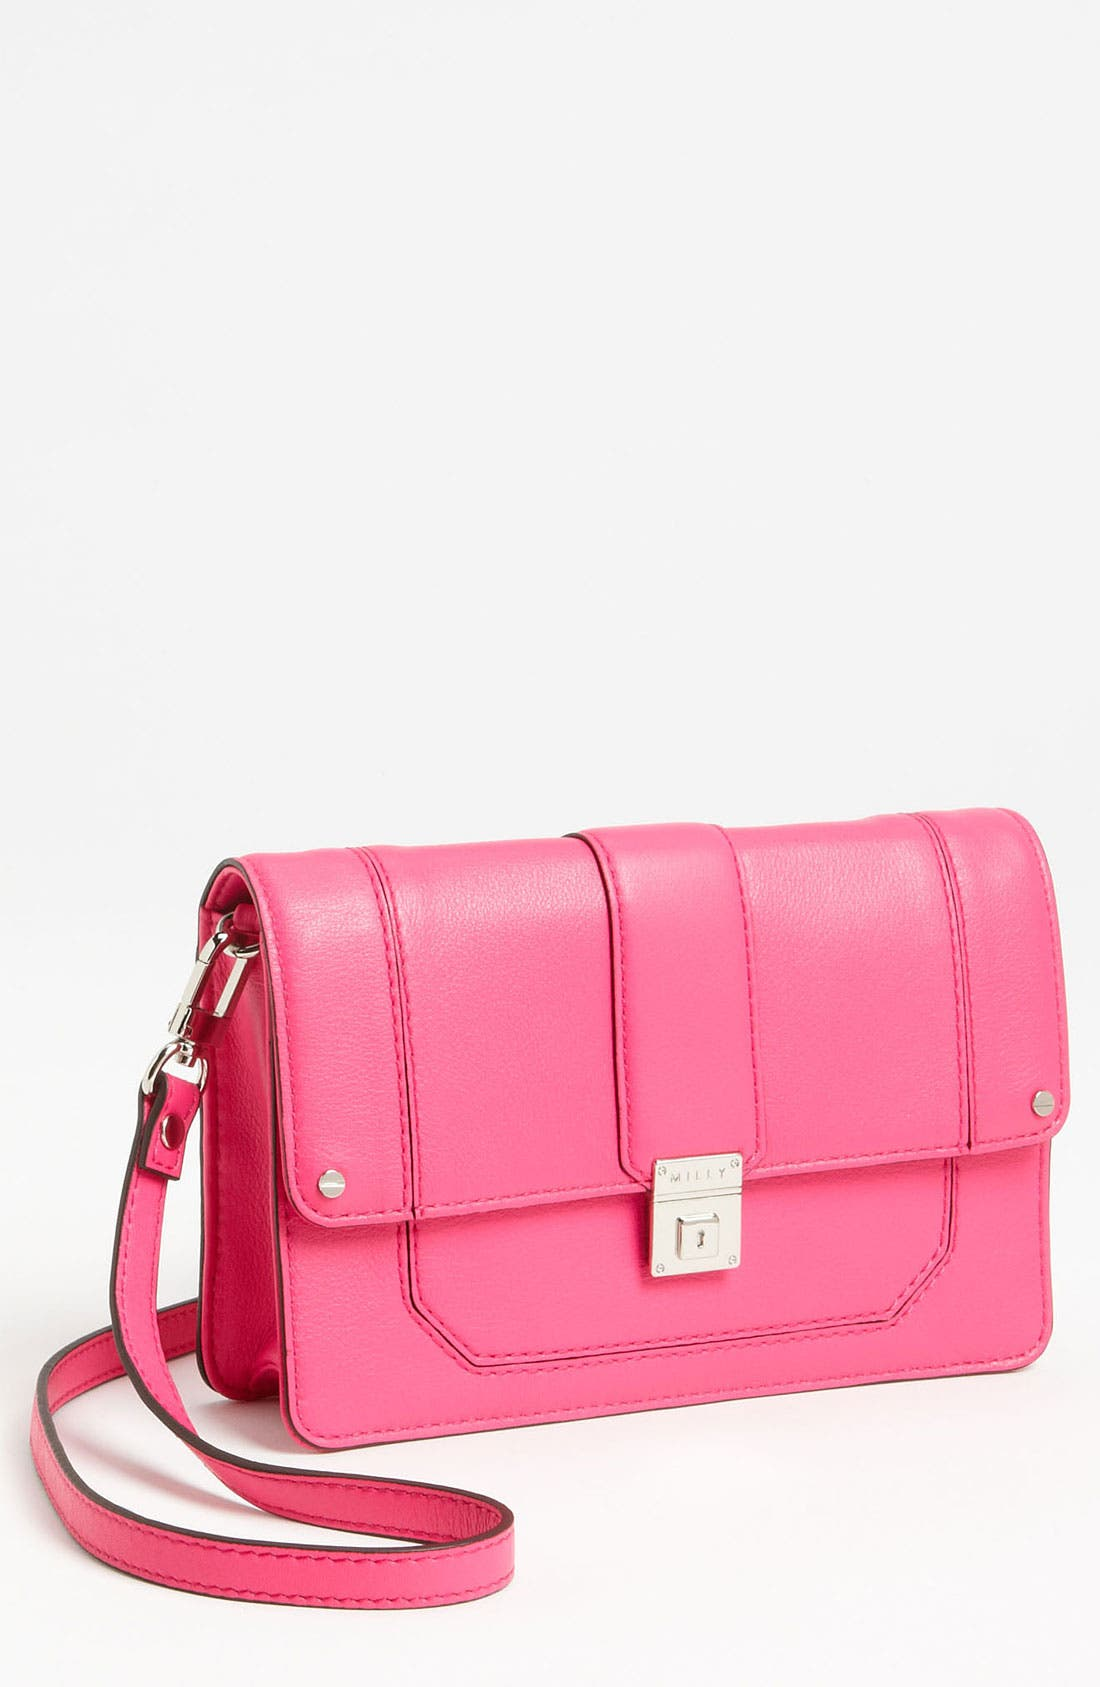 Alternate Image 1 Selected - Milly 'Monica - Mini' Crossbody Bag